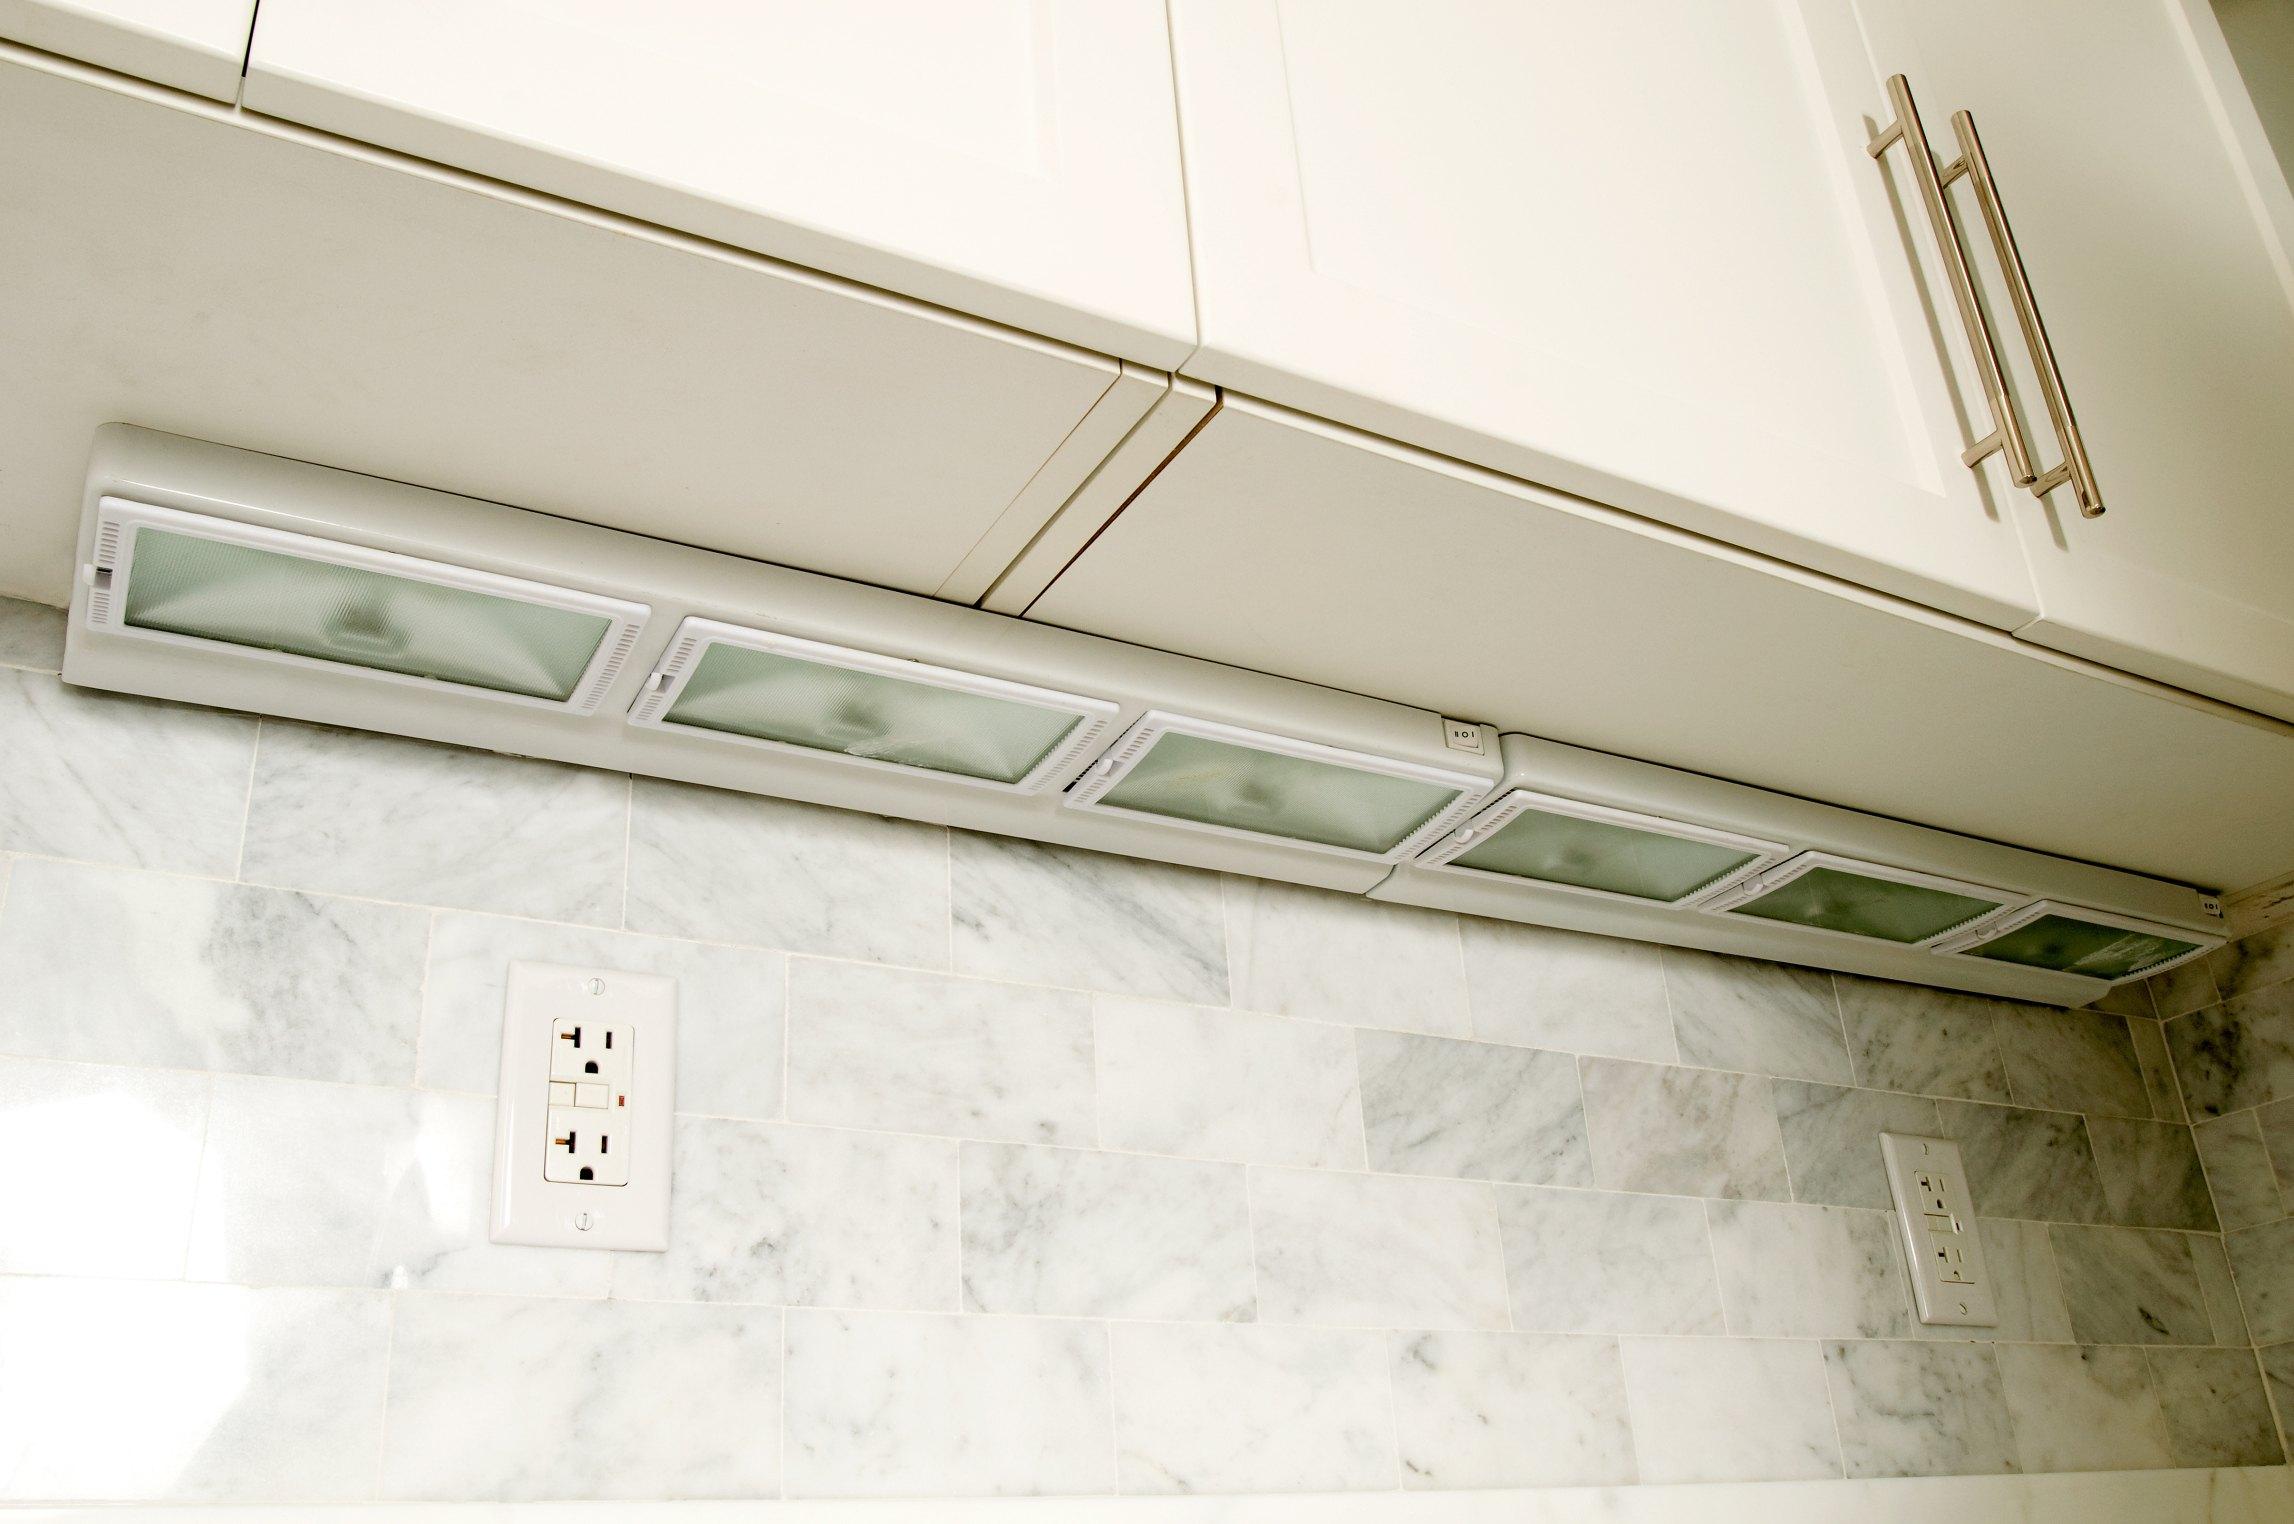 89679683 Wiring Under Cabinet Lighting on cabinet shelf lighting, wiring led tube, kitchen lighting, wiring led bulbs, undershelf lighting,